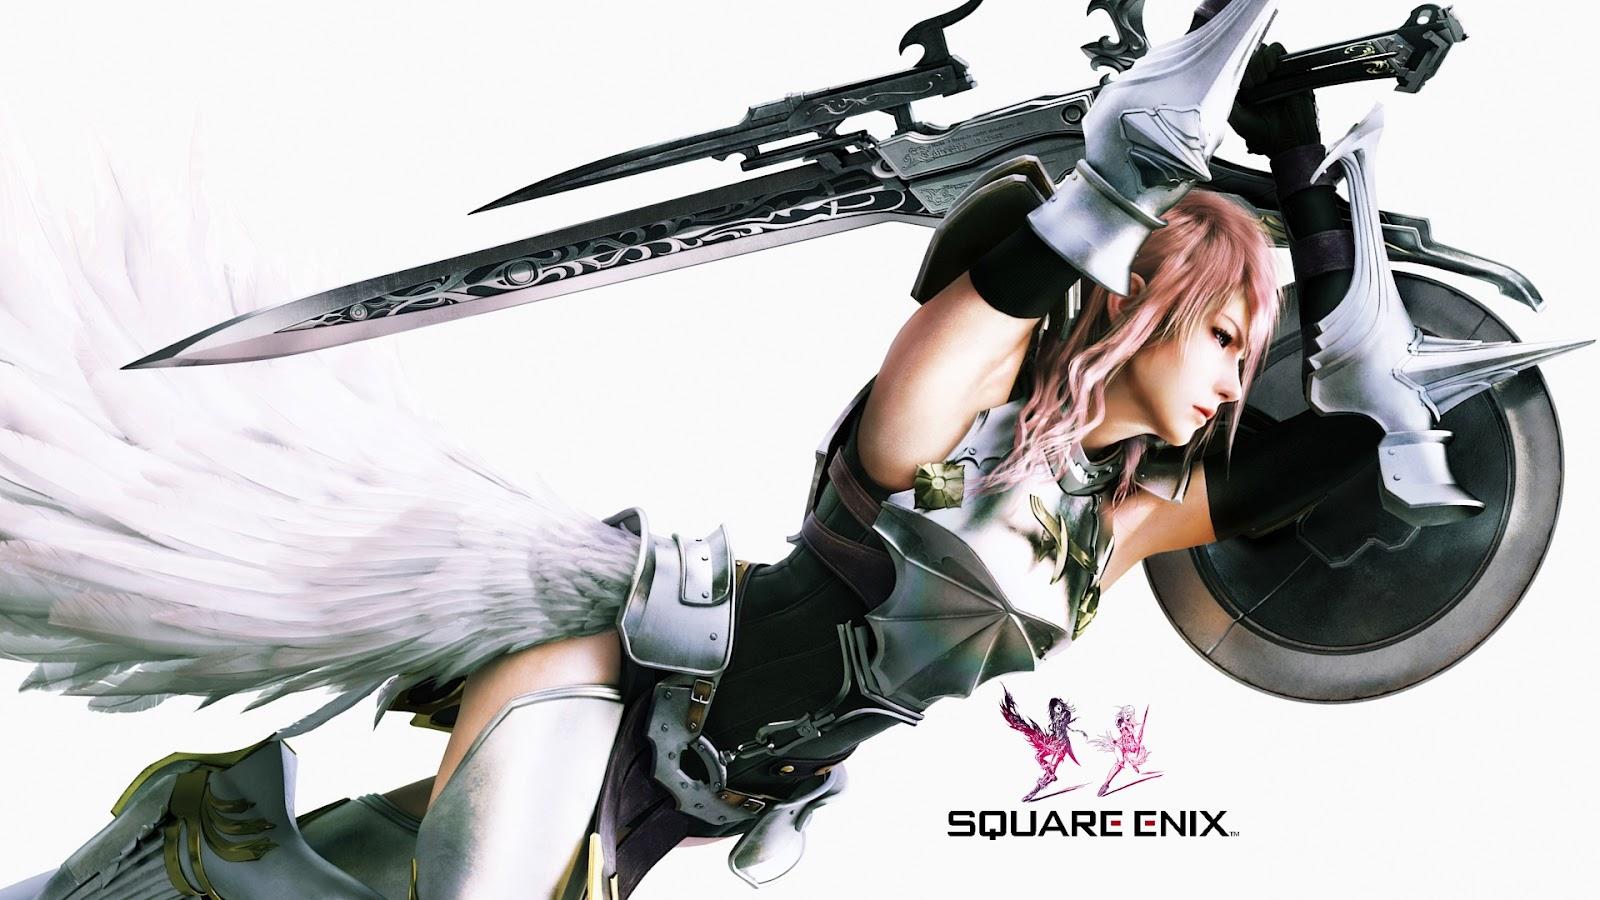 Final Fantasy 13 2 Wallpaper: Mashababko: Wallpaper Final Fantasy Xiii-2 Hd